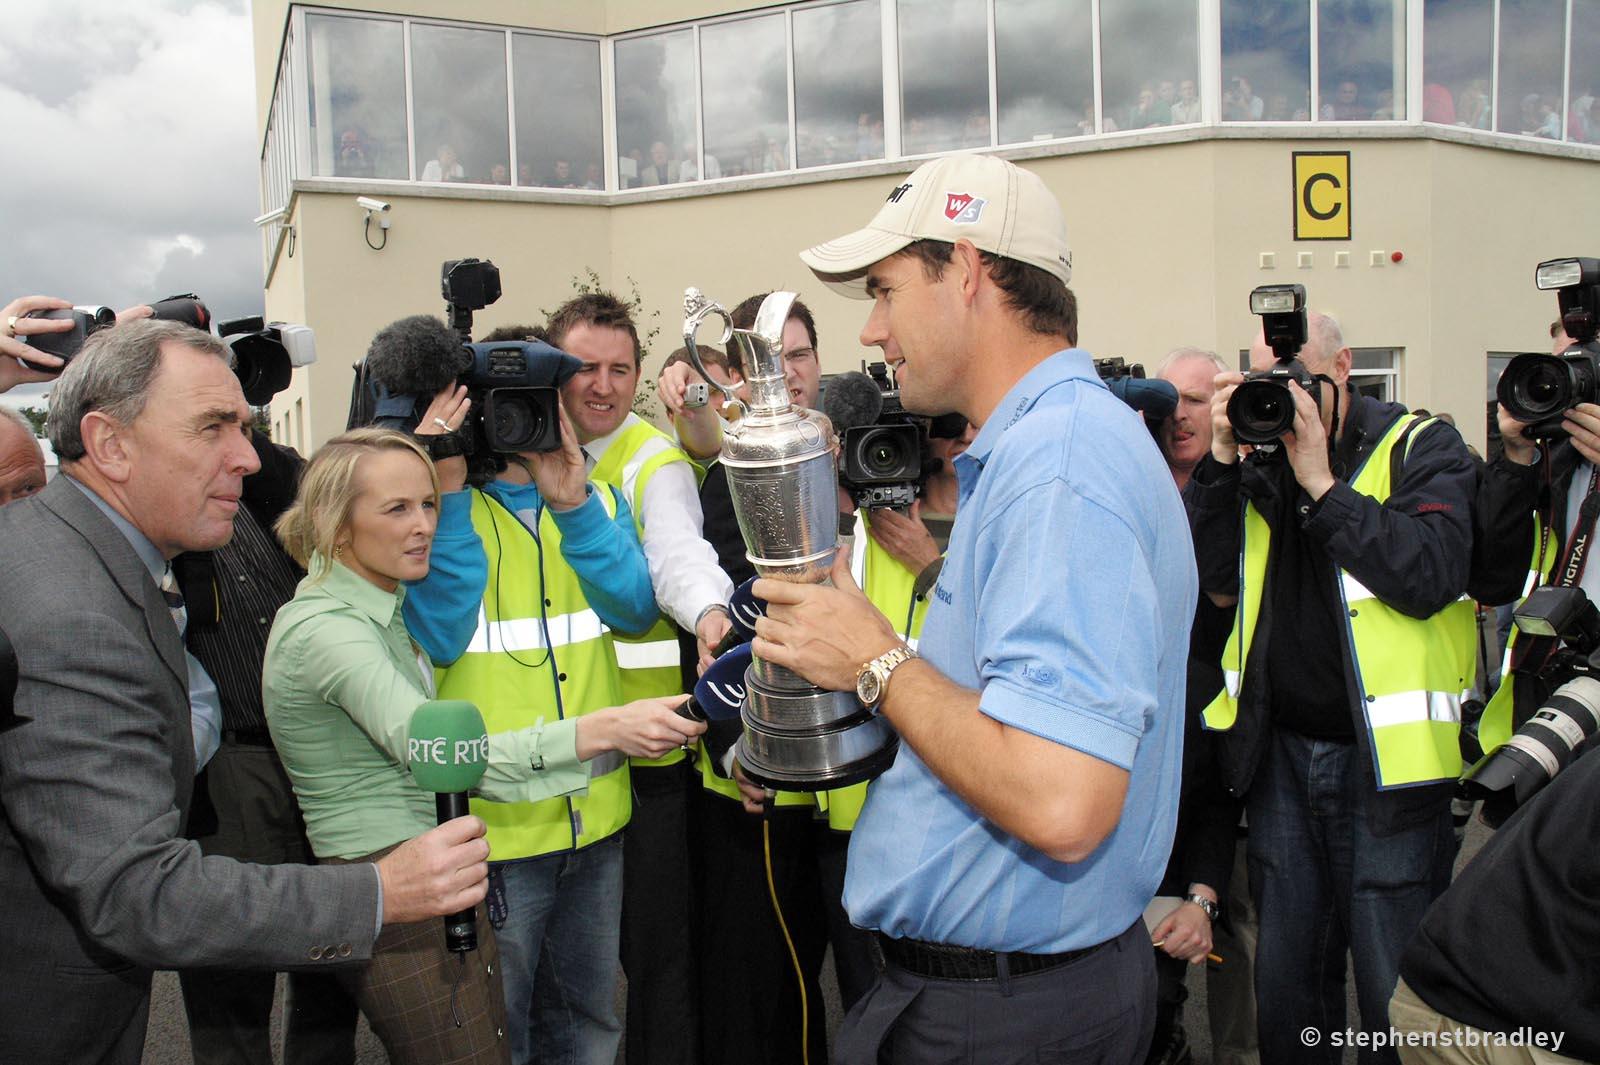 Editorial photographer Dublin portfolio photo 7234963 of Padraig Harrington arriving in Ireland after winning The Open Championship, by Stephen S T Bradley